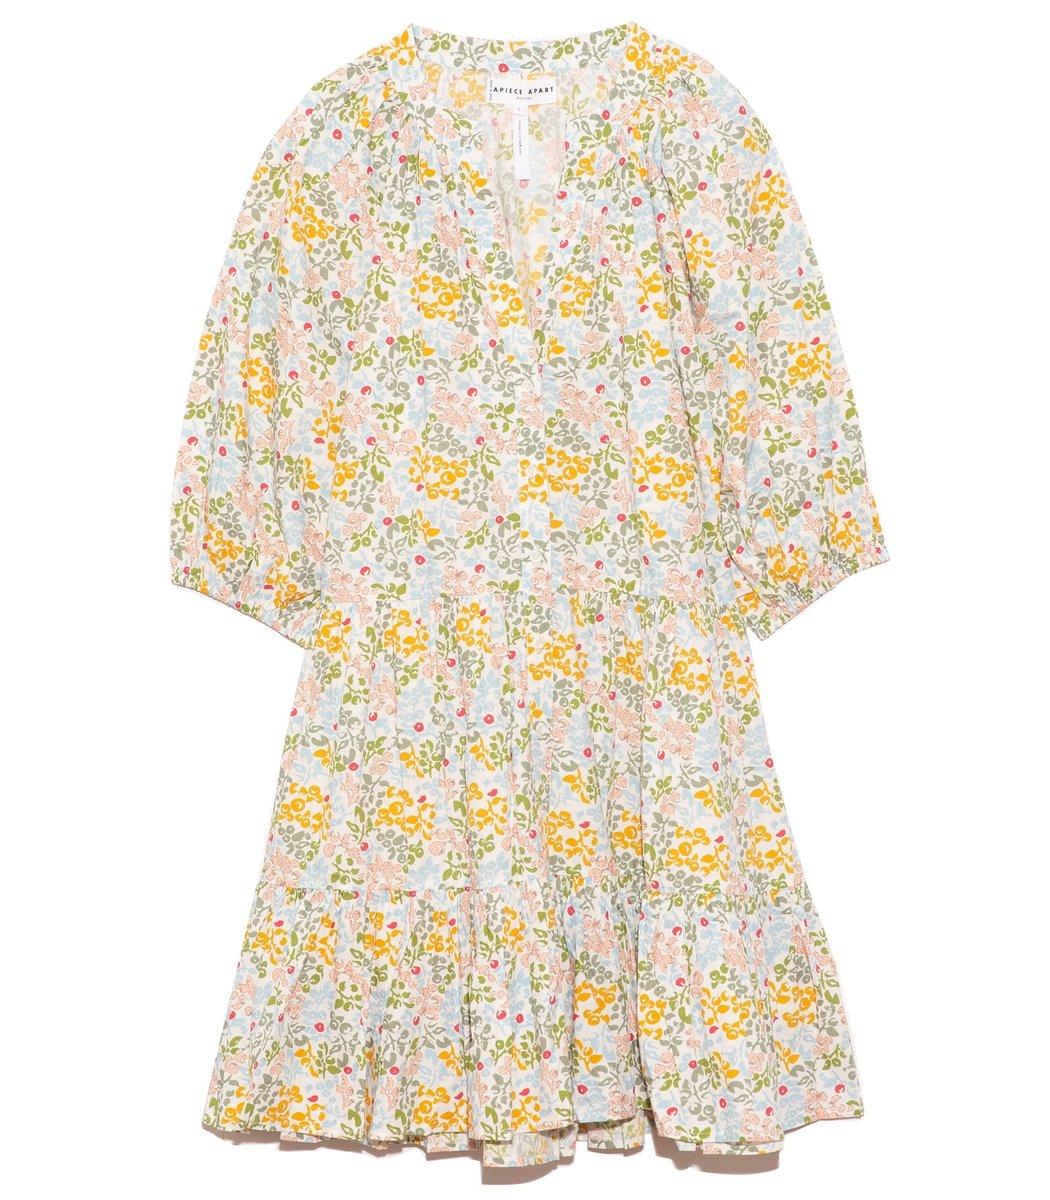 Apiece Apart Mini Mitte Dress in Light Daisy